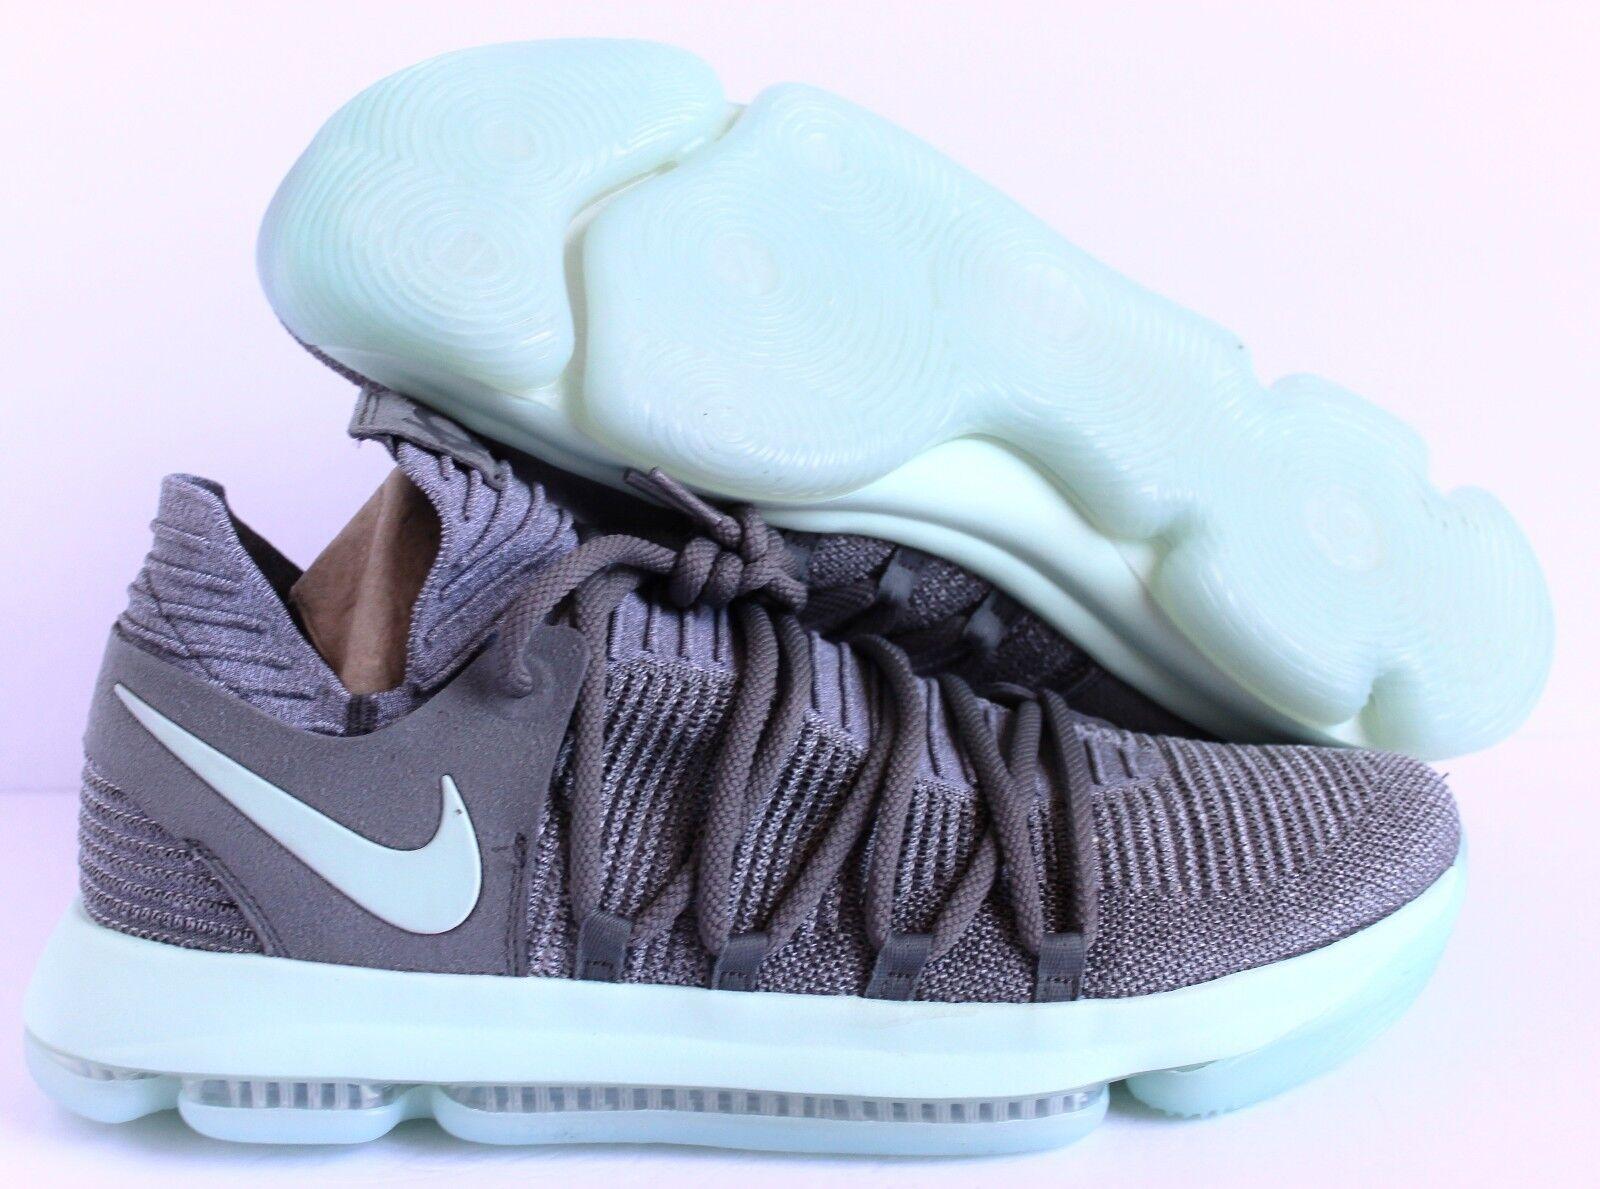 NEW Nike Zoom  KD X Kevin Durant KD10 Cool Grrey-Igloo-bianca SZ 14 [897815-002]